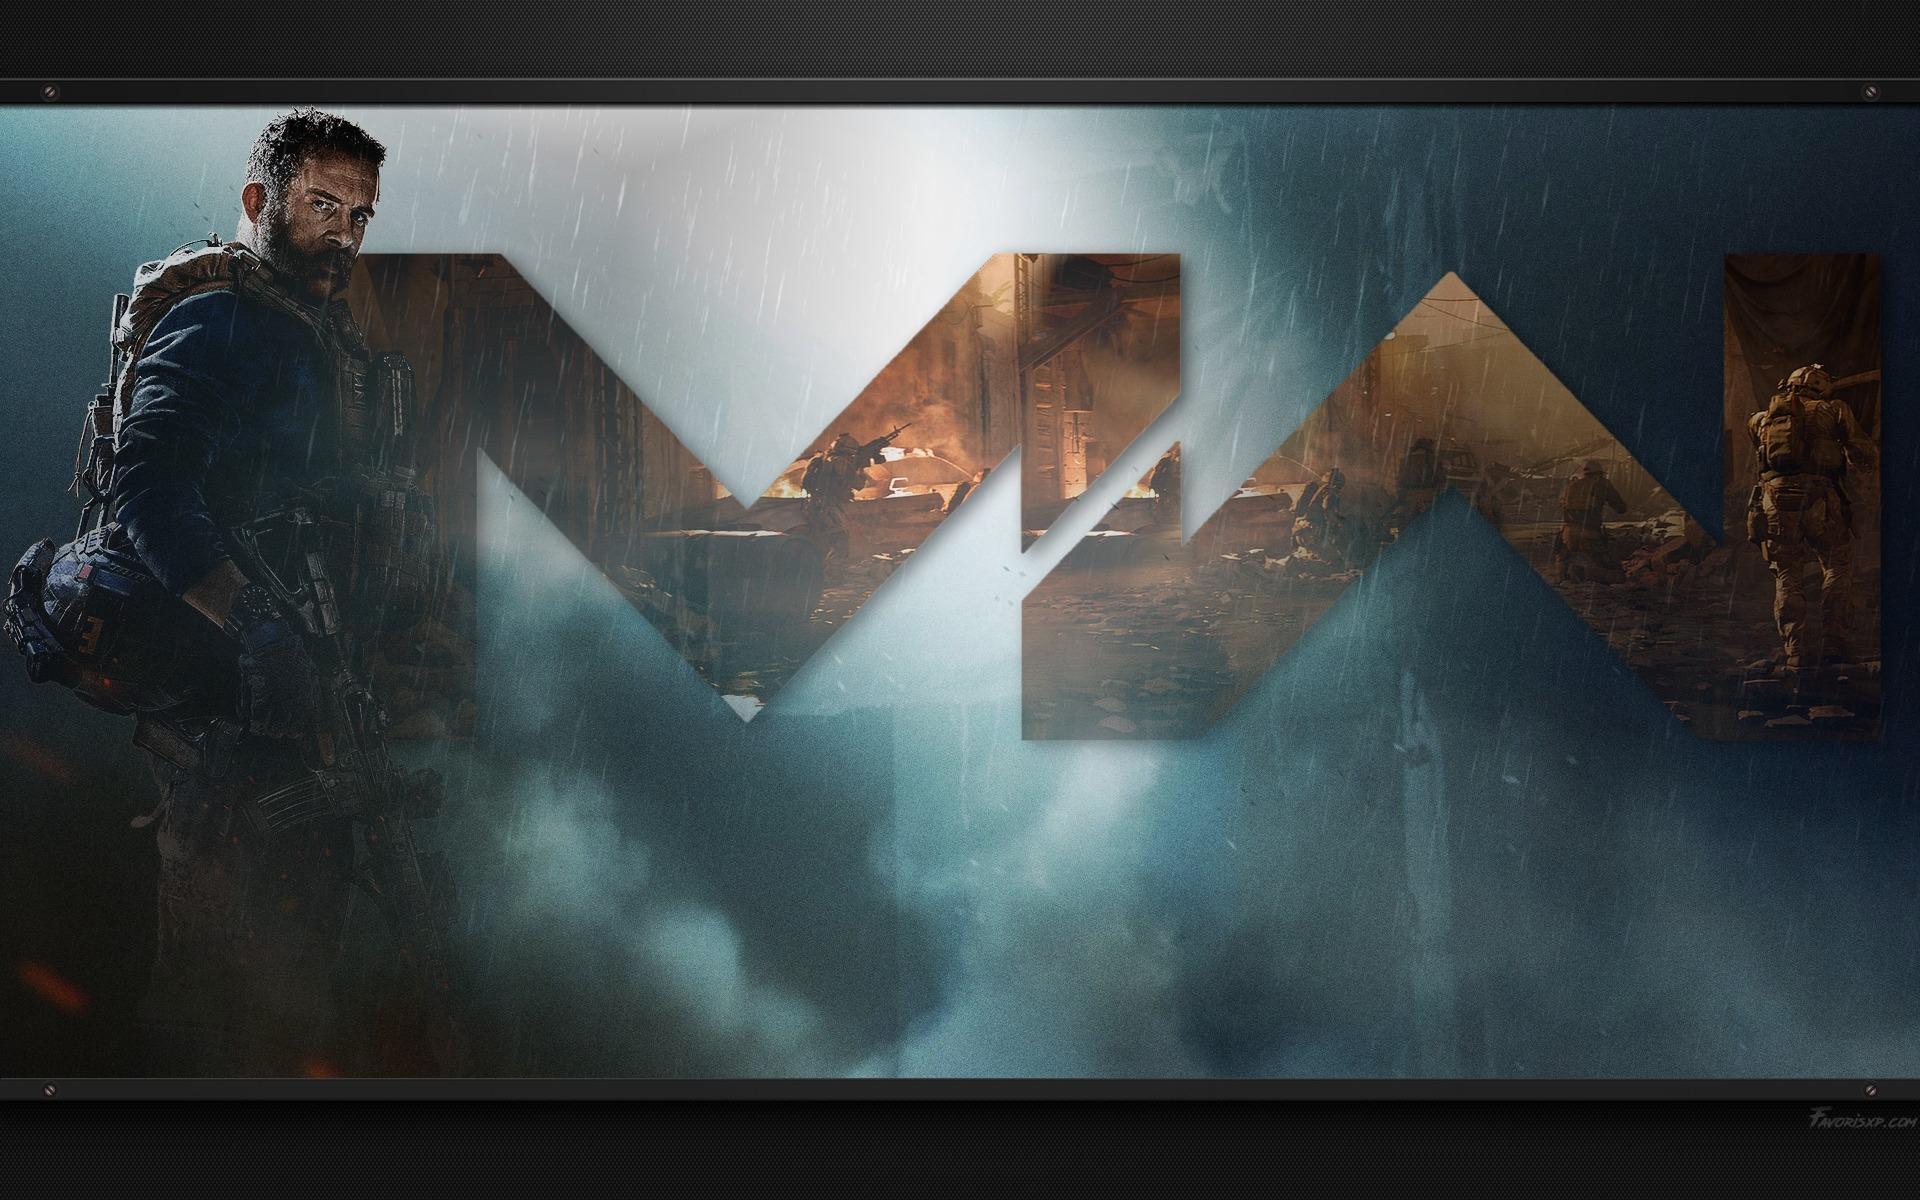 Call Of Duty Modern Warfare Fonds D Ecran 2019 Image